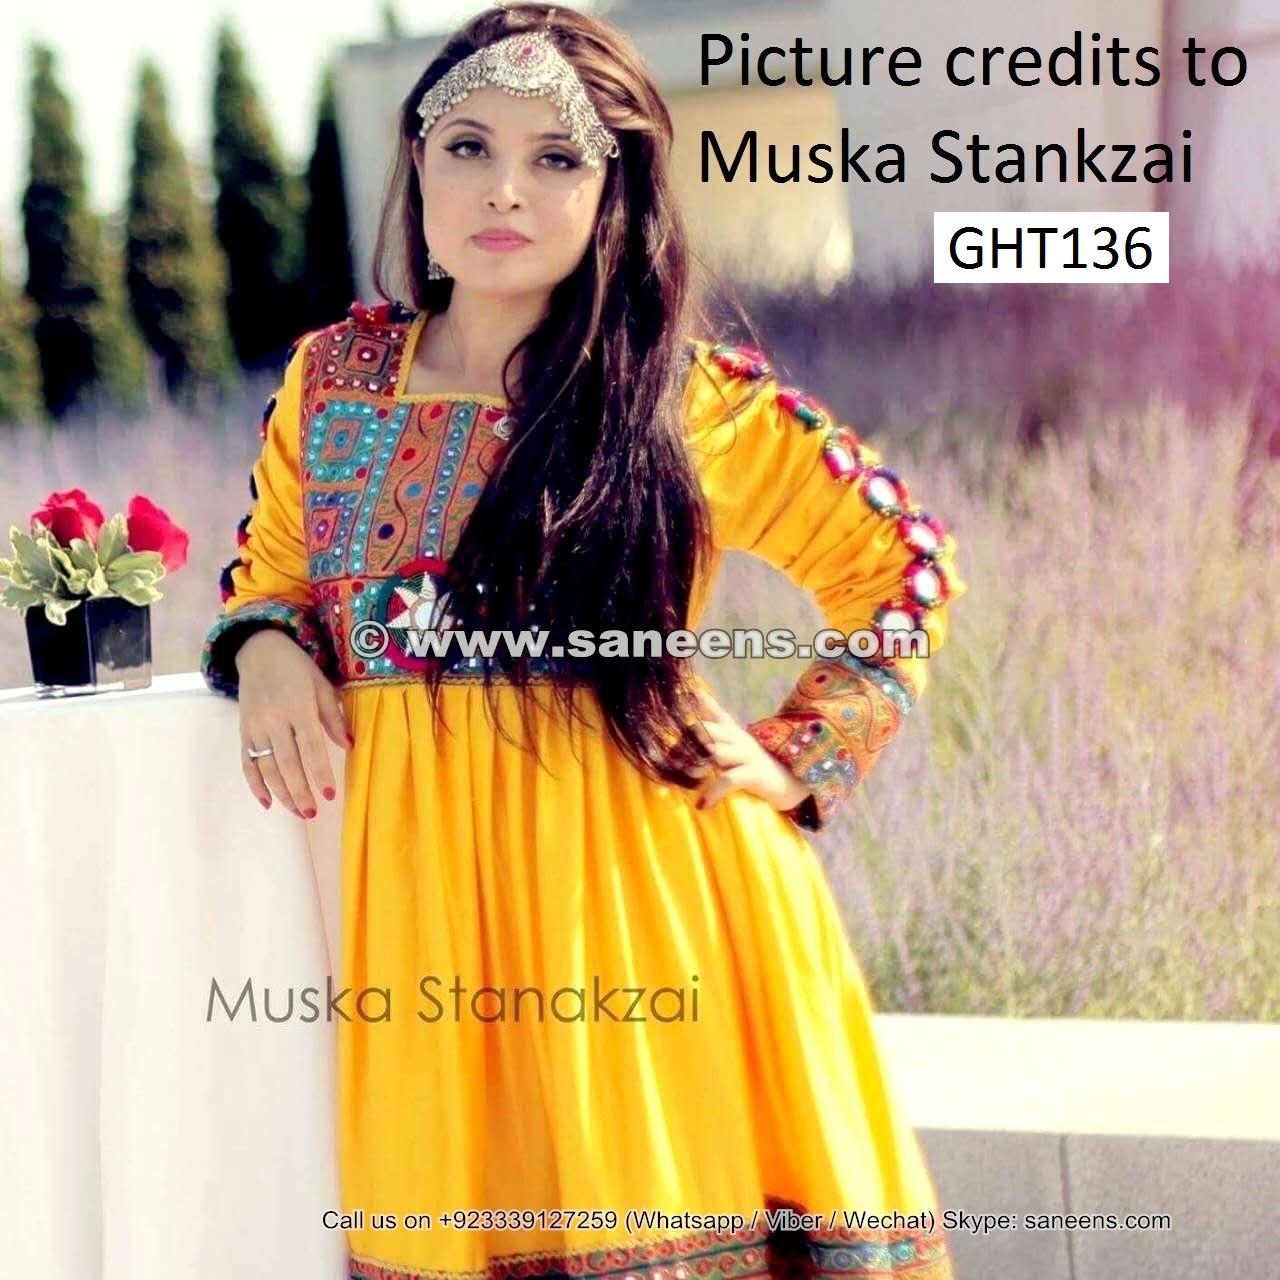 ght136-client-images-2.jpg